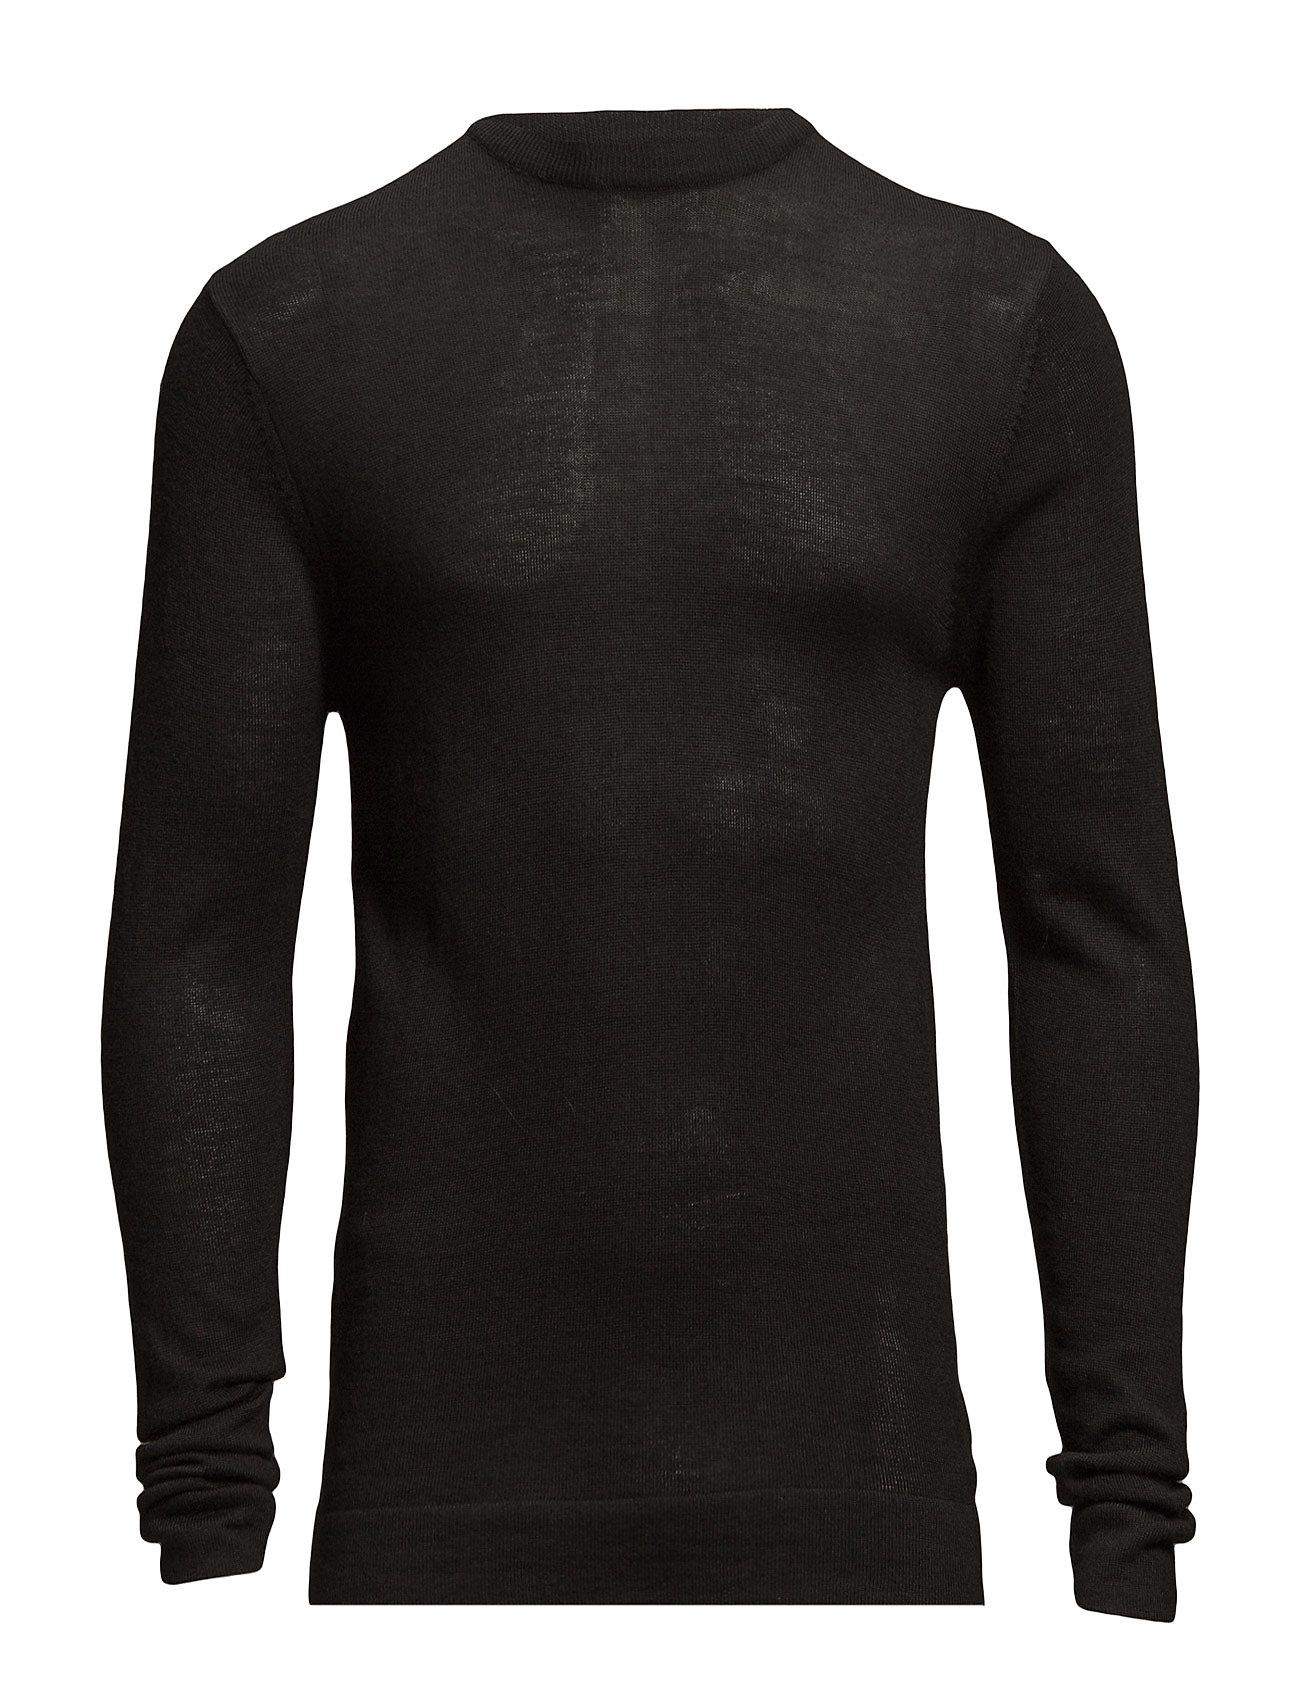 Lindbergh Merino knit o-neck - BLACK